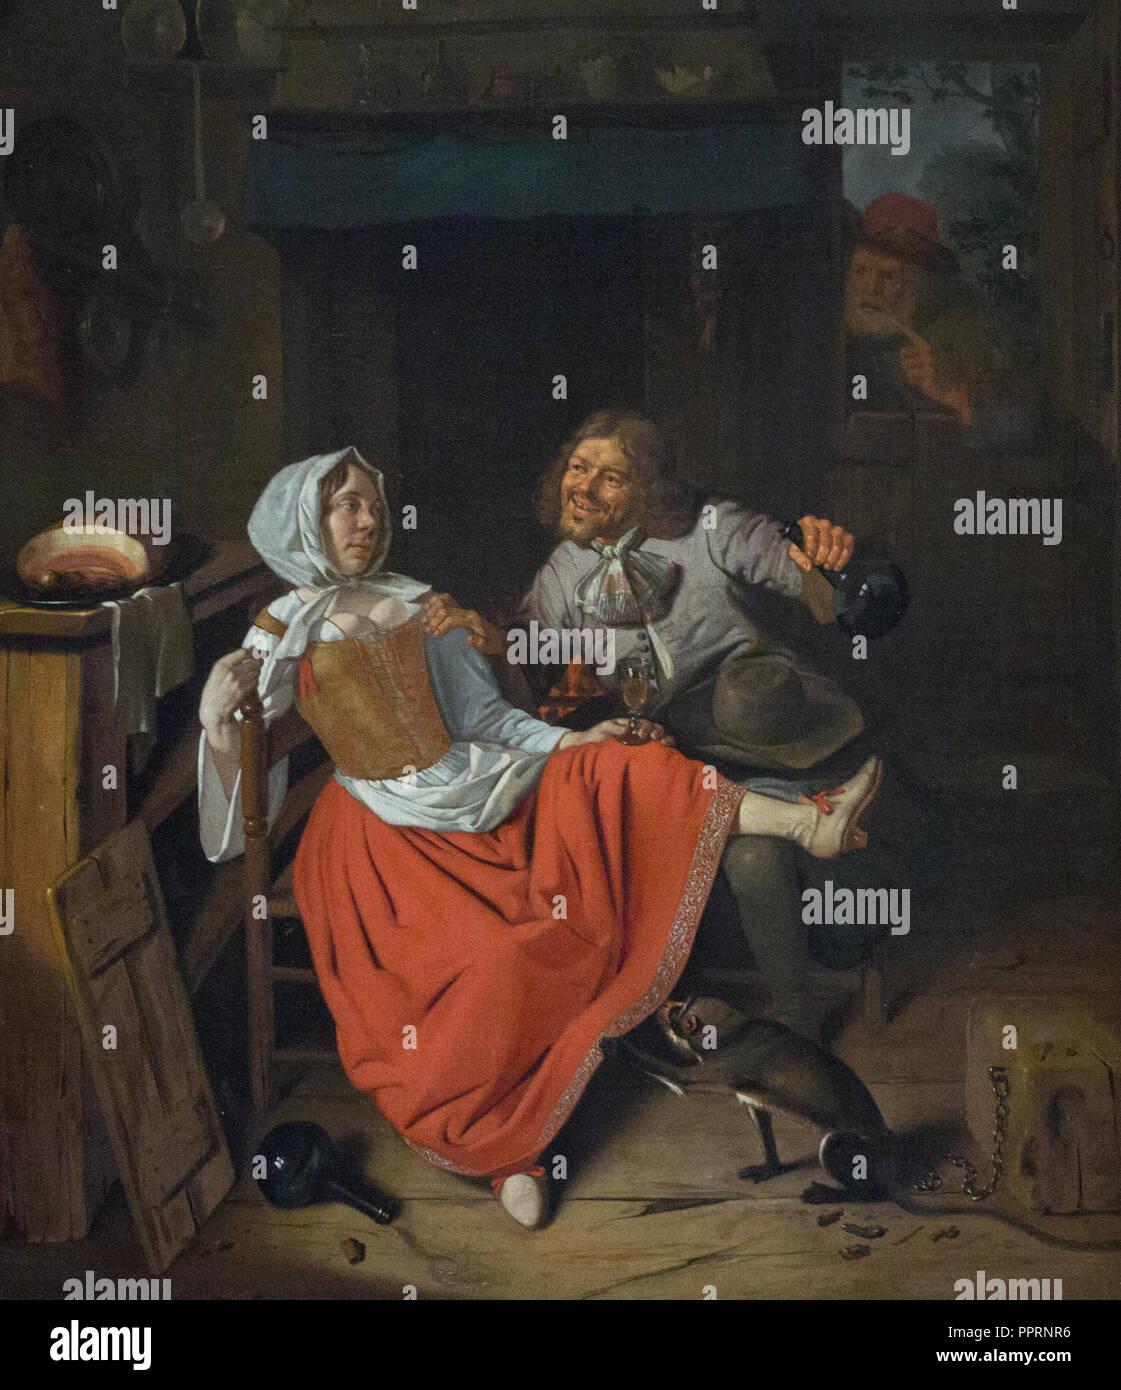 Pieter Gerritsz Roestraten - el licencioso cocina mucama, c. 1665 Imagen De Stock